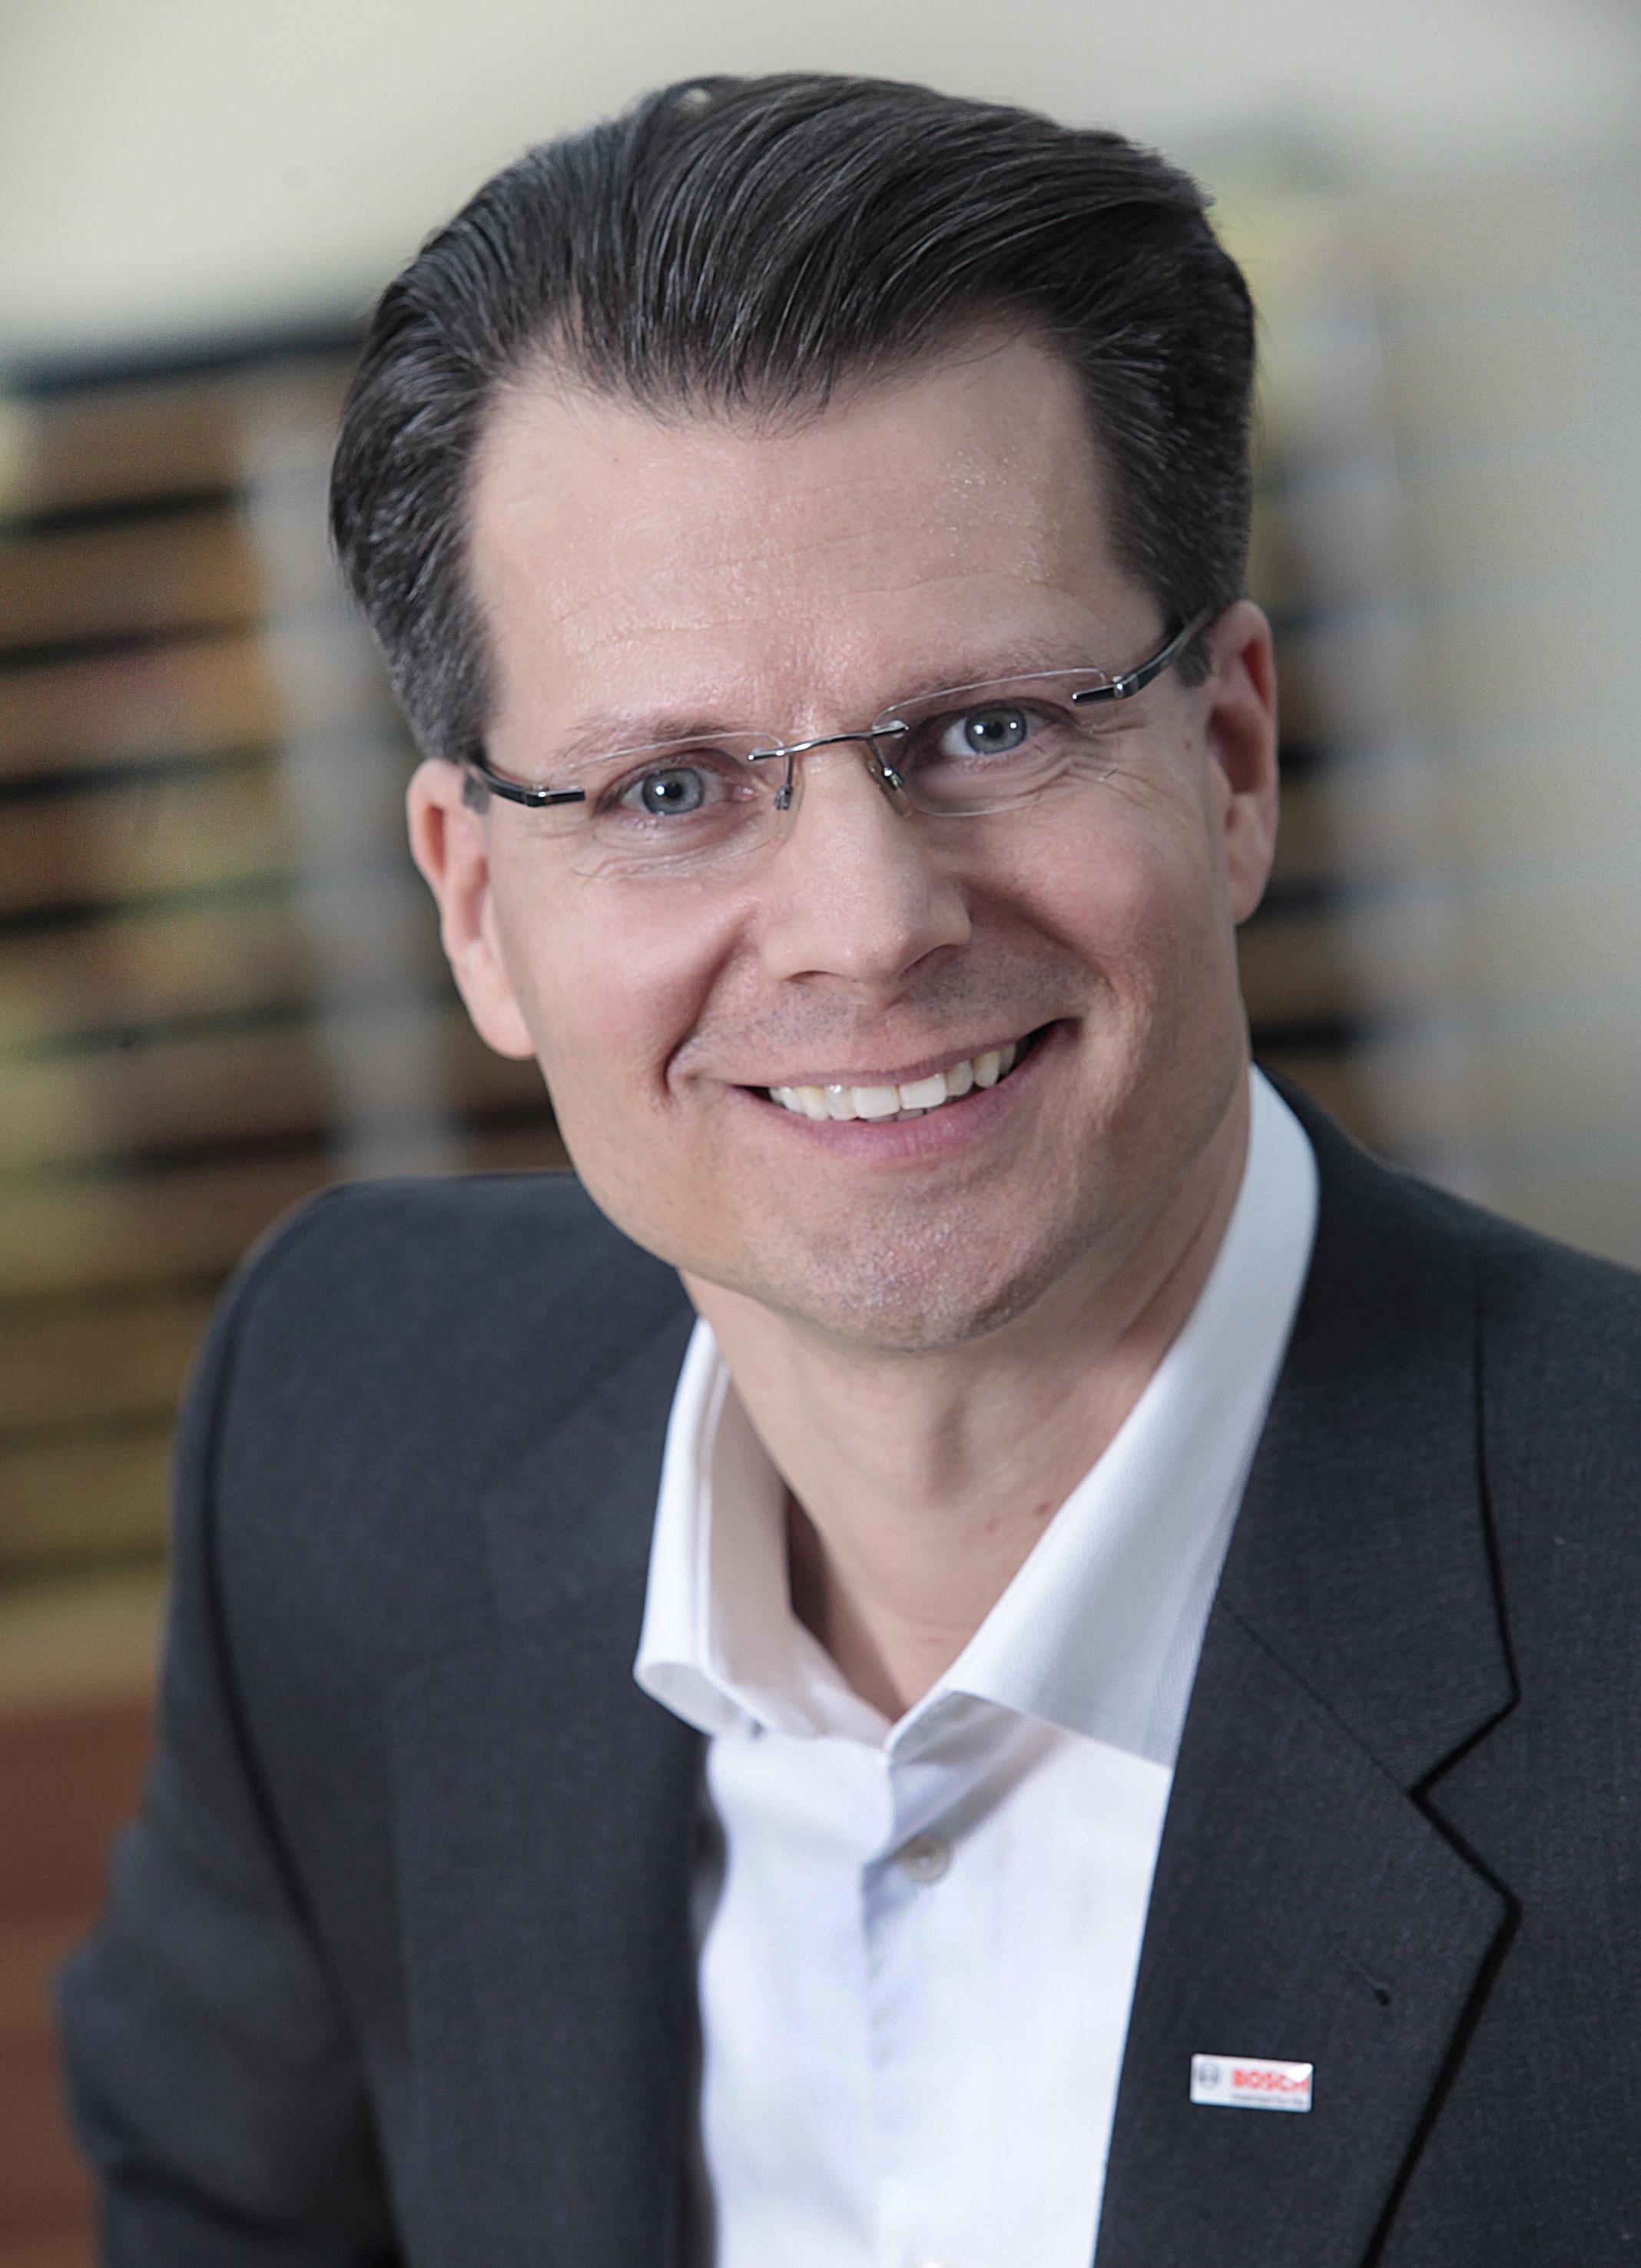 Henning von Boxberg, President of the Robert Bosch Power Tools GmbH